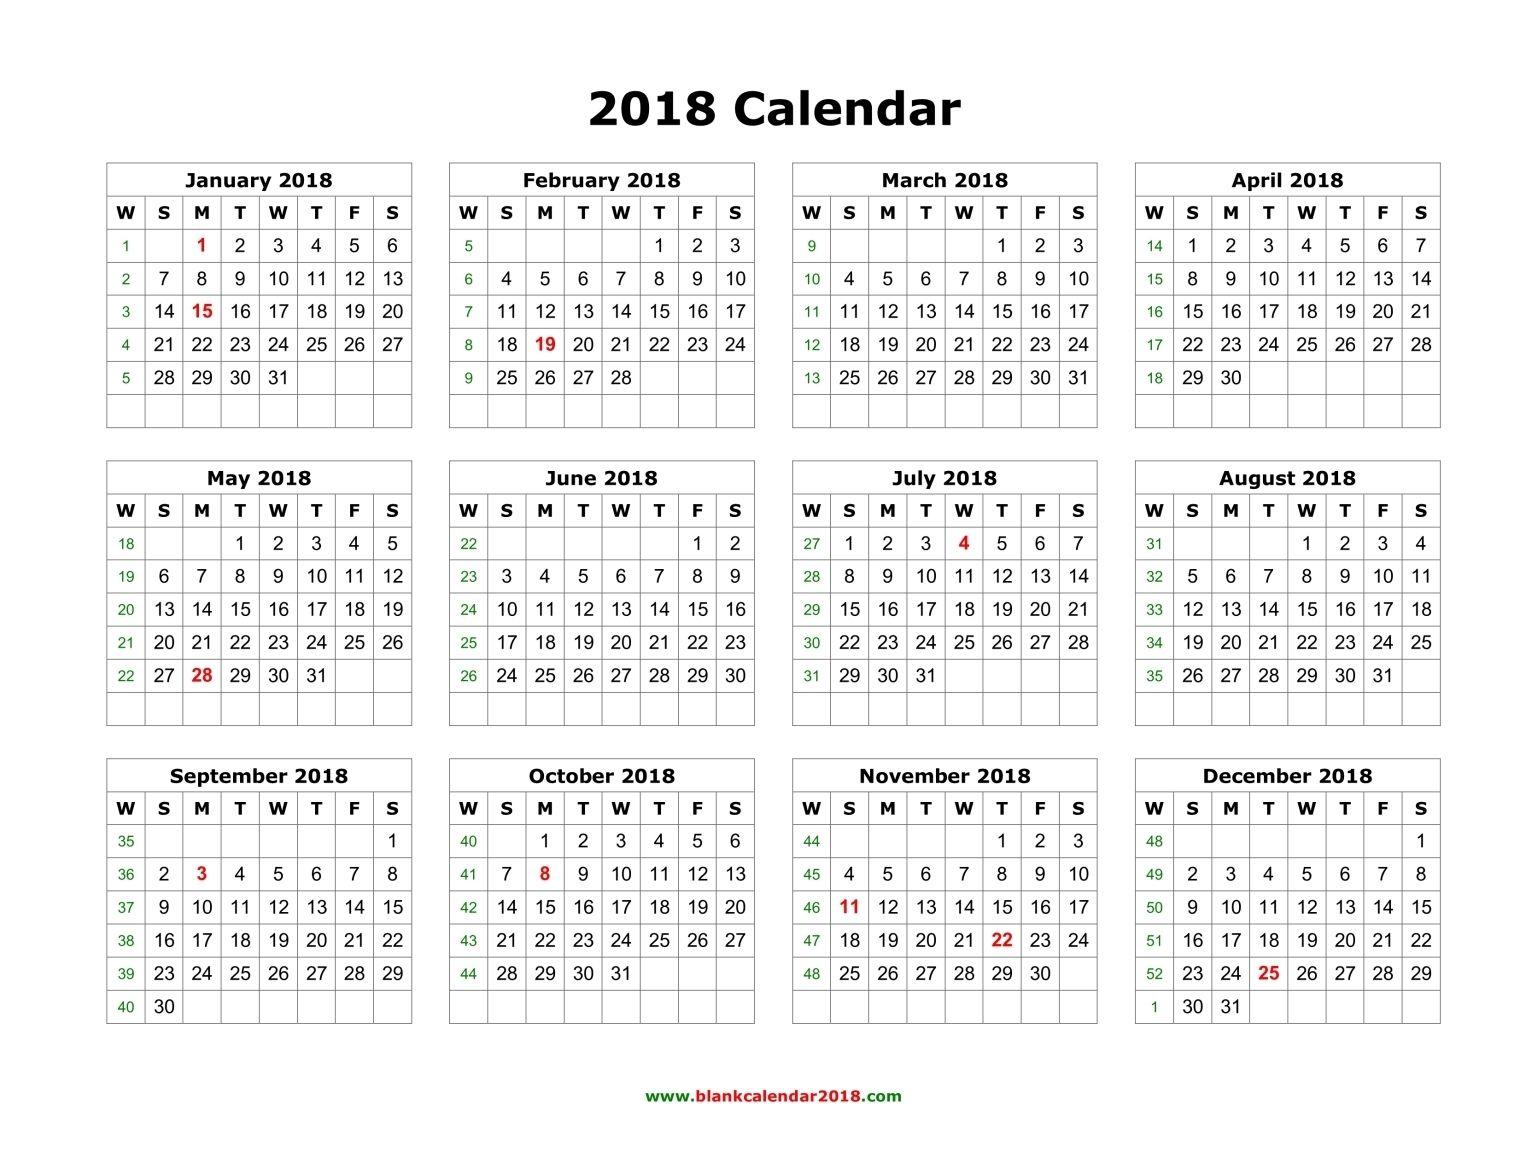 Pincalendar Printable On 2018 Calendar | 2018 Calendar